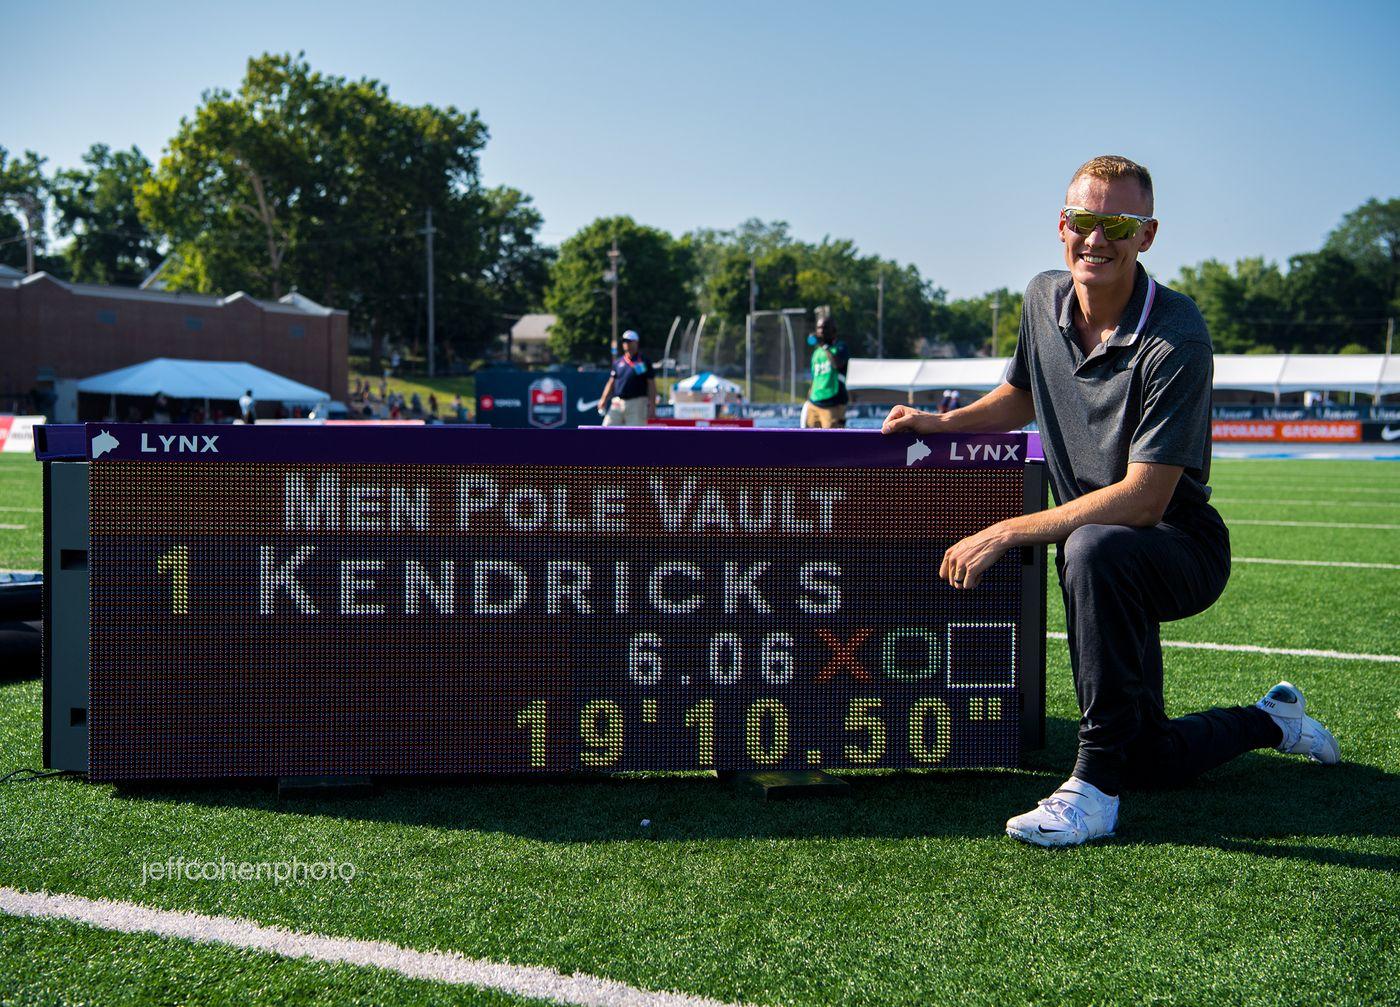 Sam Kendricks, pole vault, 6.06m American record